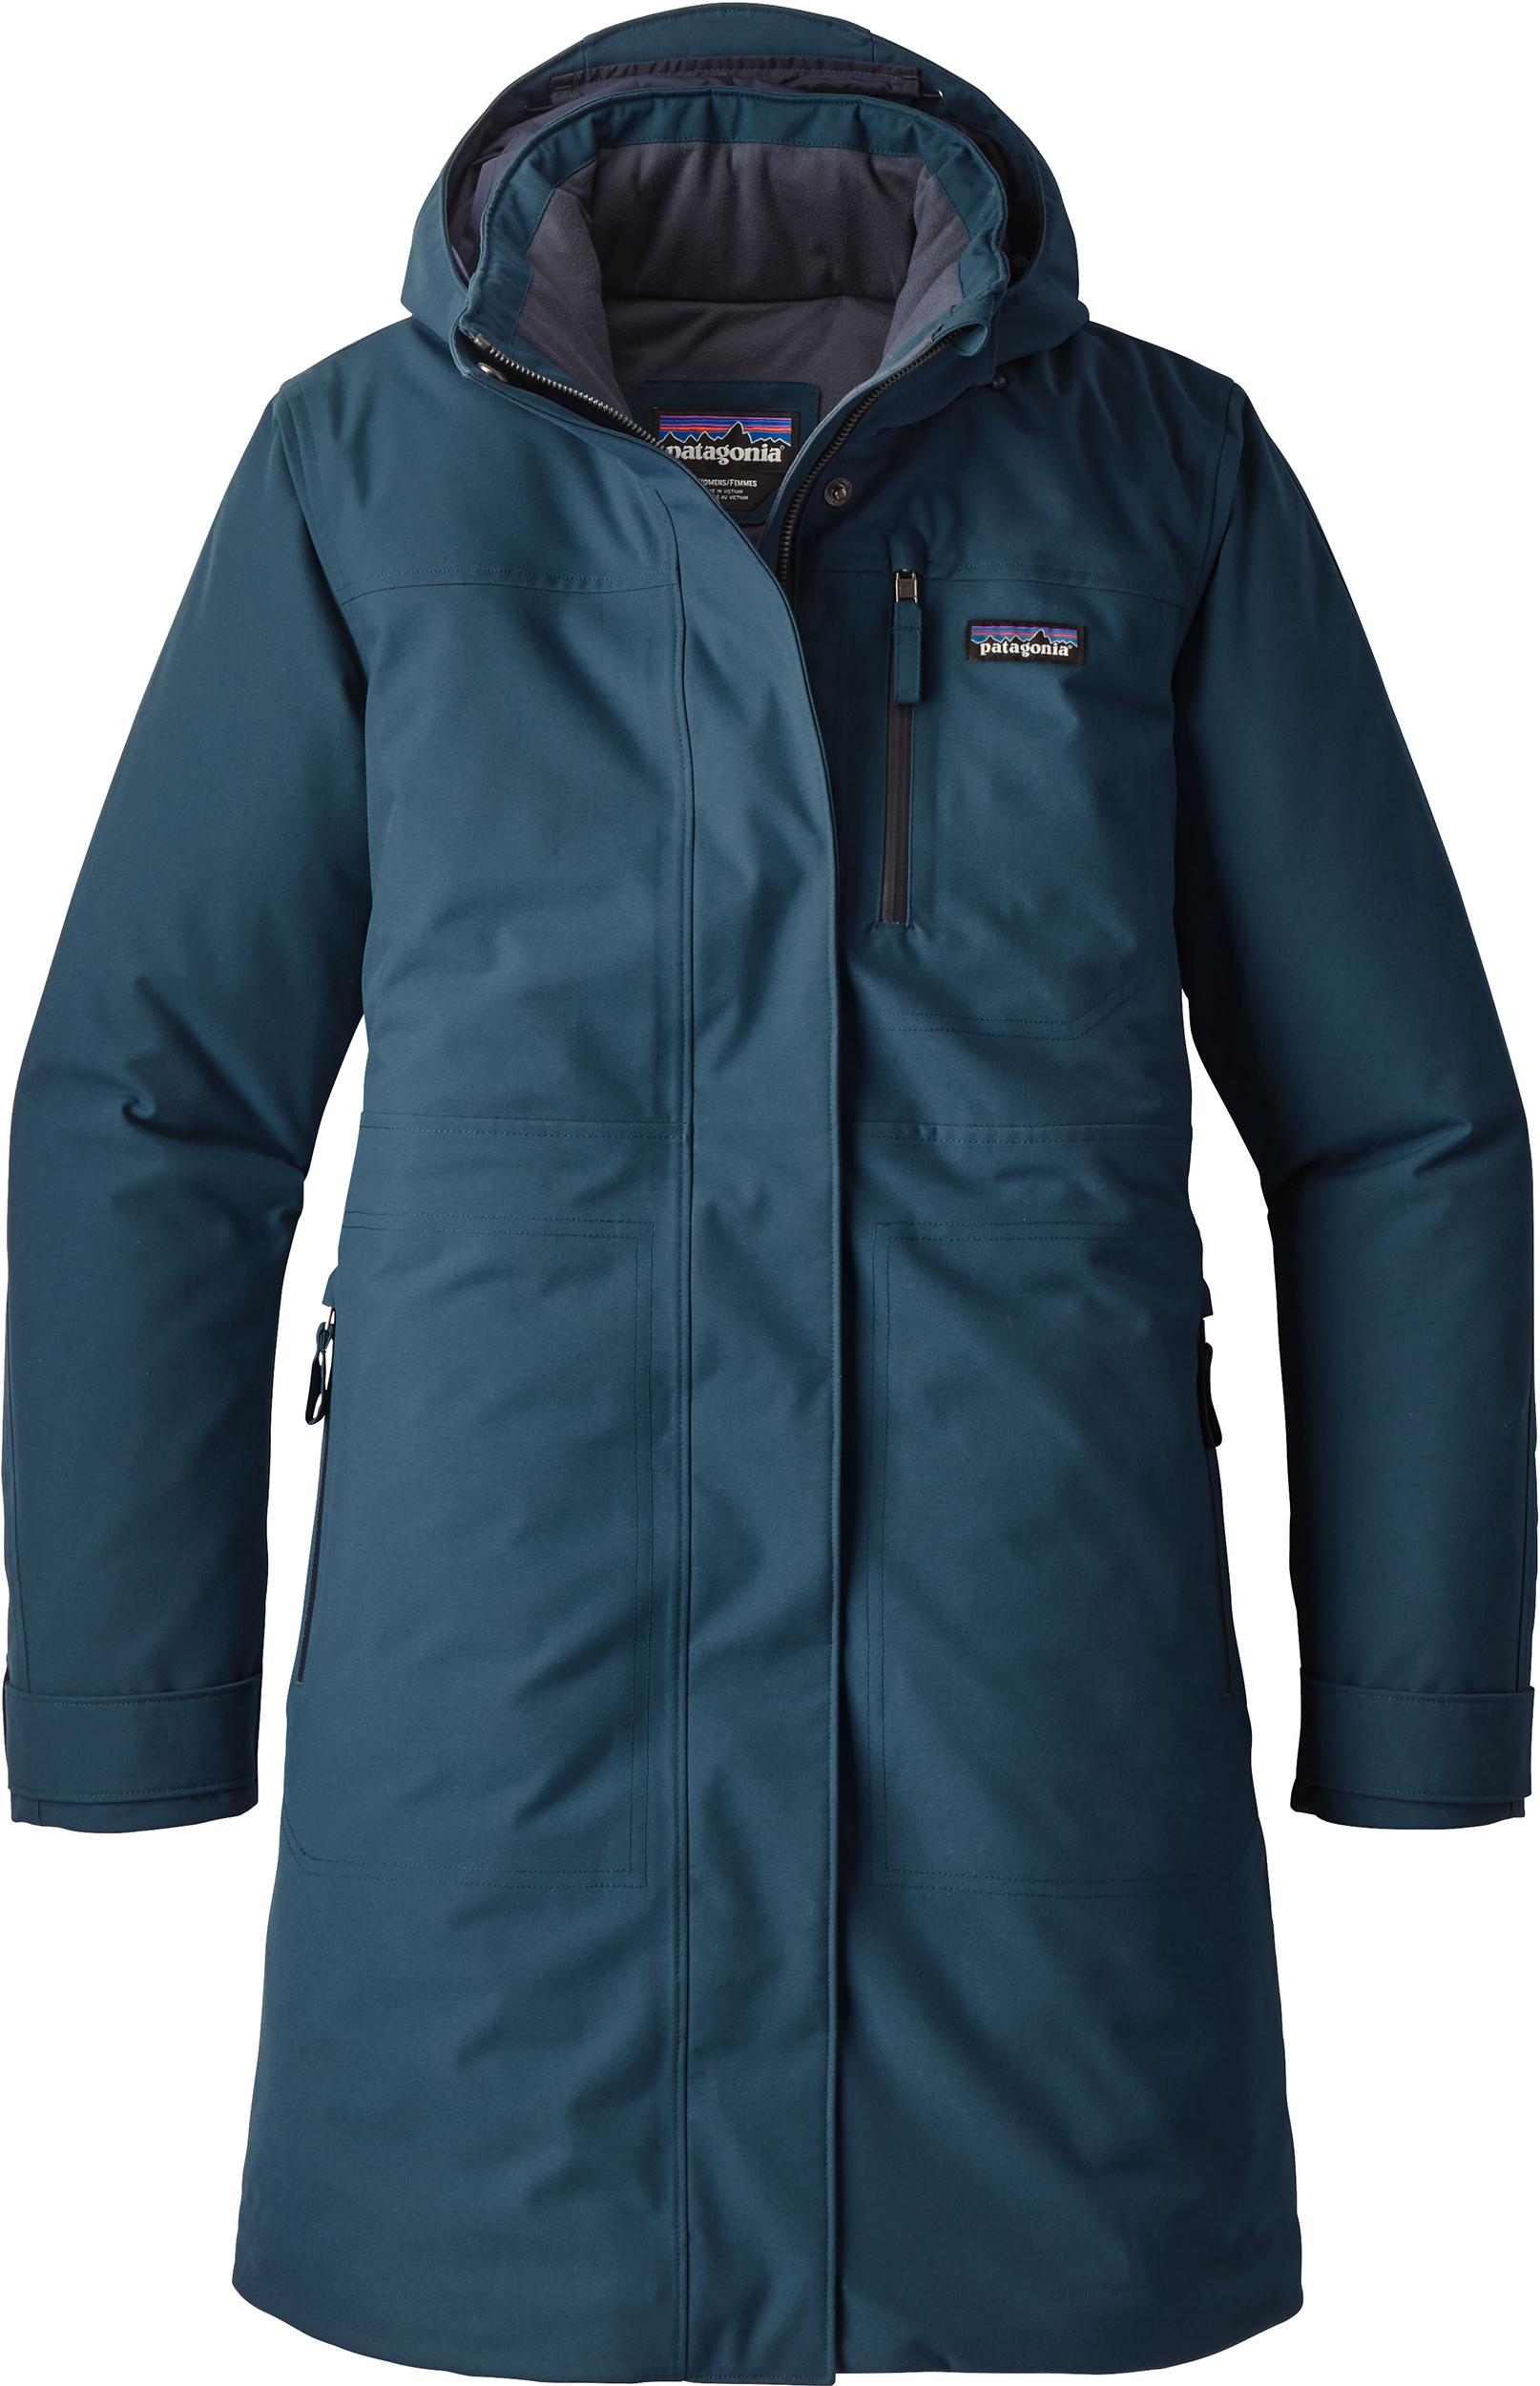 uk cheap sale excellent quality latest fashion Patagonia Stormdrift Parka - Women's | MEC